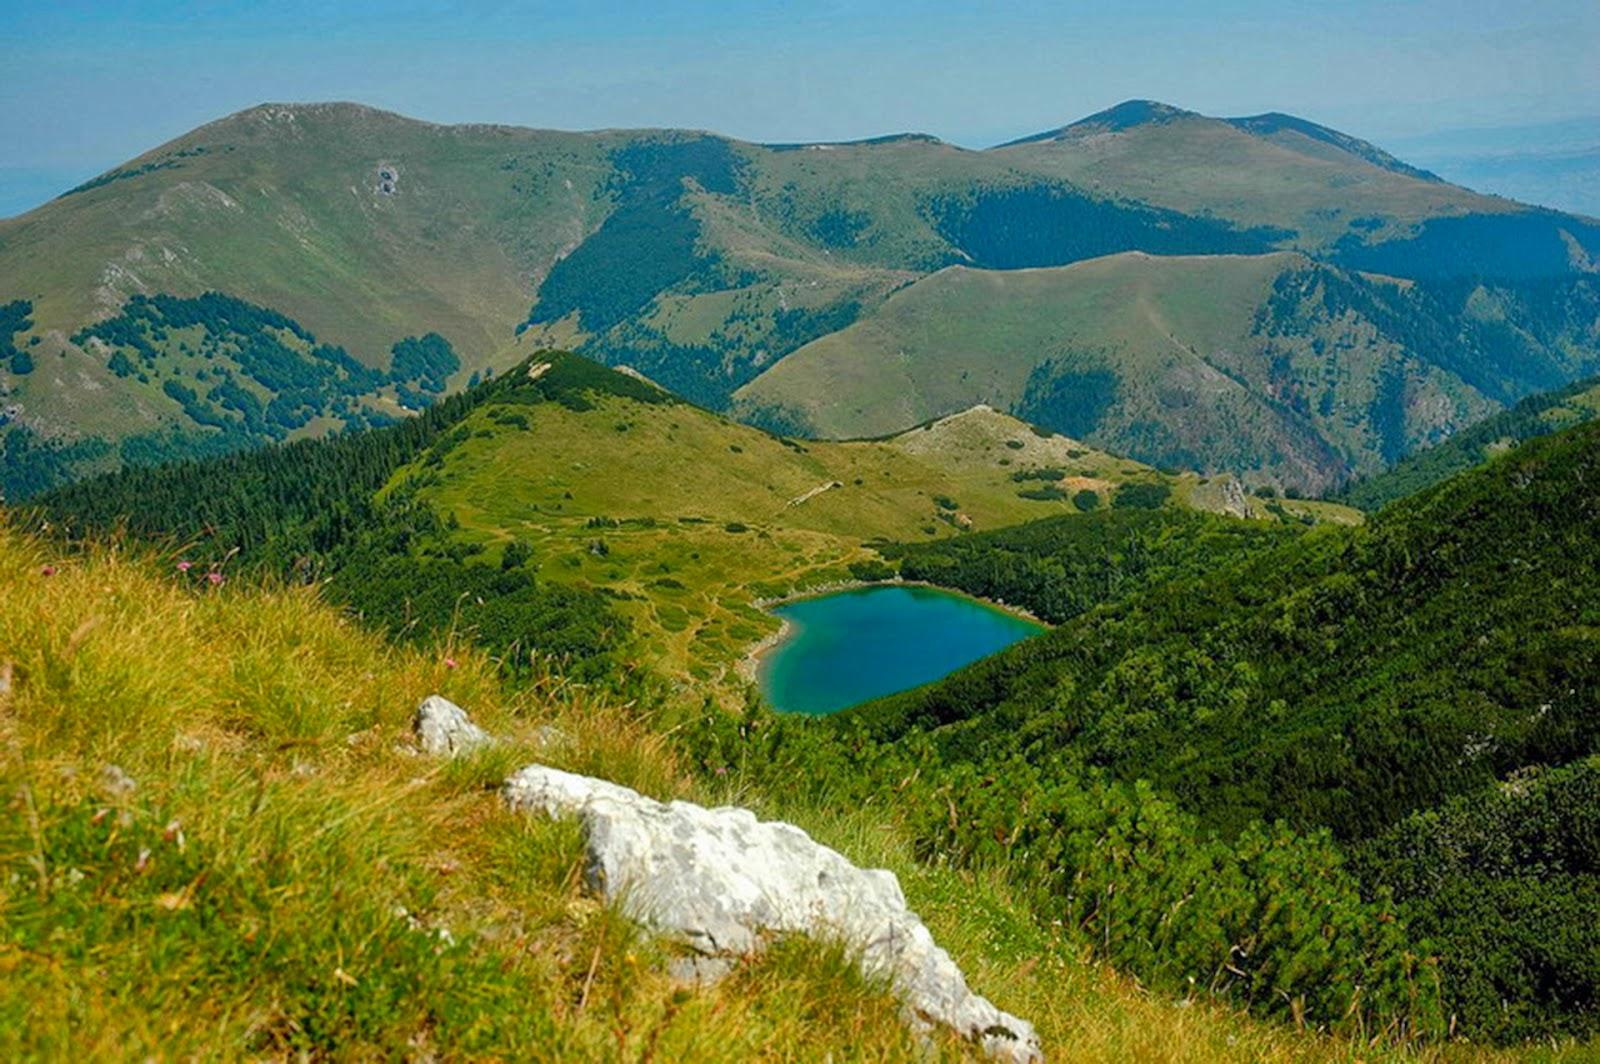 Full HD Lake Lush Green Nature Desktop Backgrounds Image Wallpaper Free